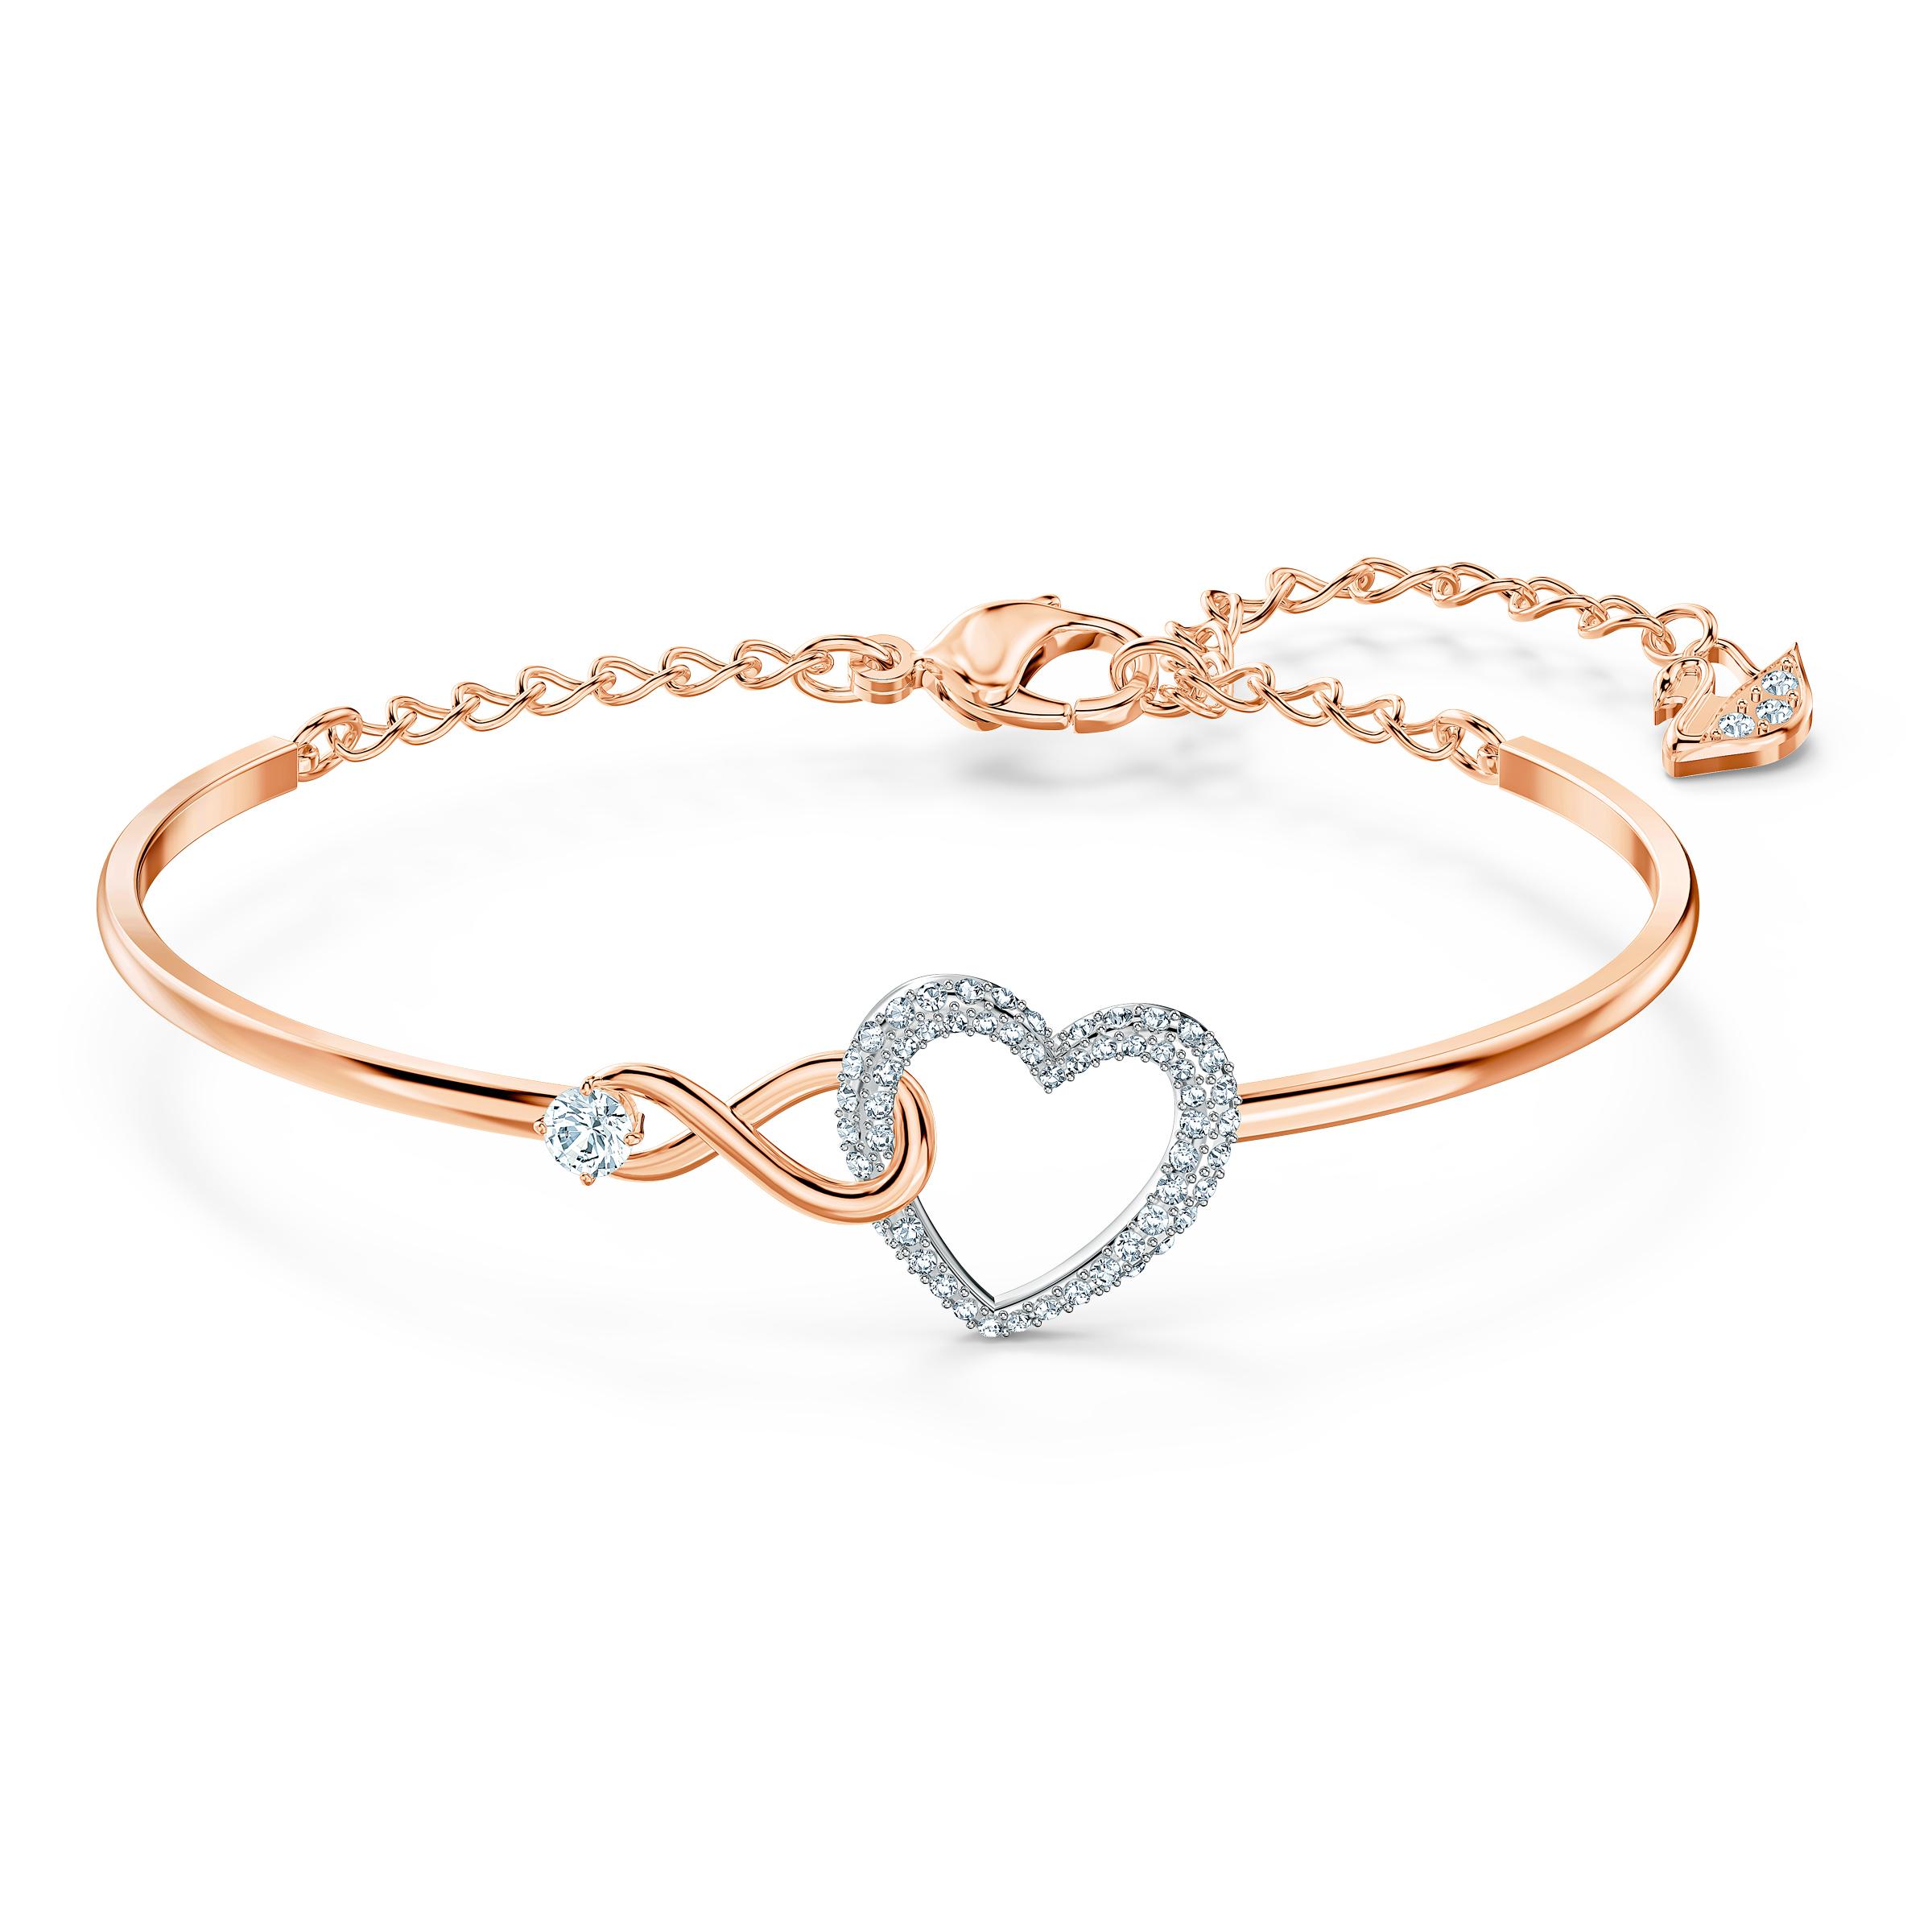 Bracelet-jonc Swarovski Infinity Heart, blanc, finition mix de métal Swarovski